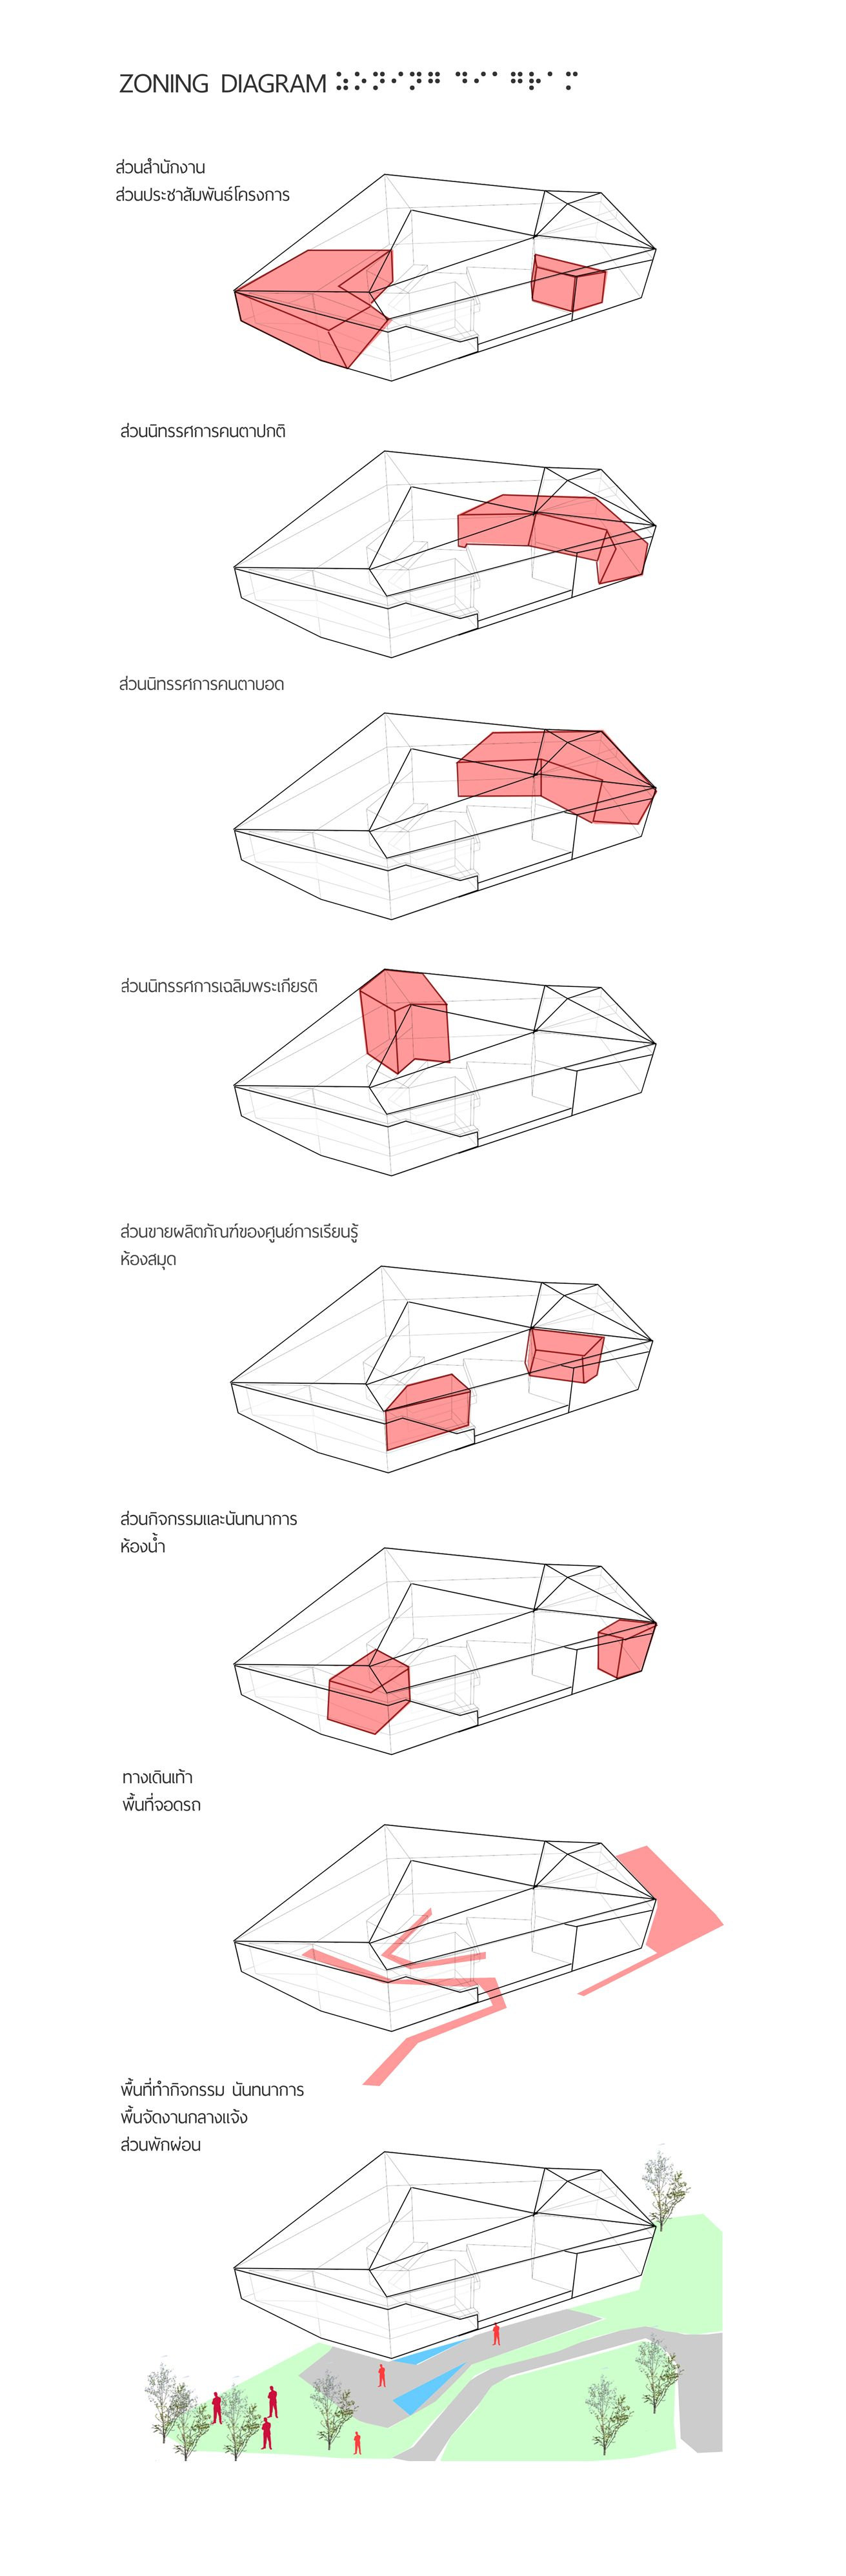 zoning diagram architectural drawings pinterest organigramme